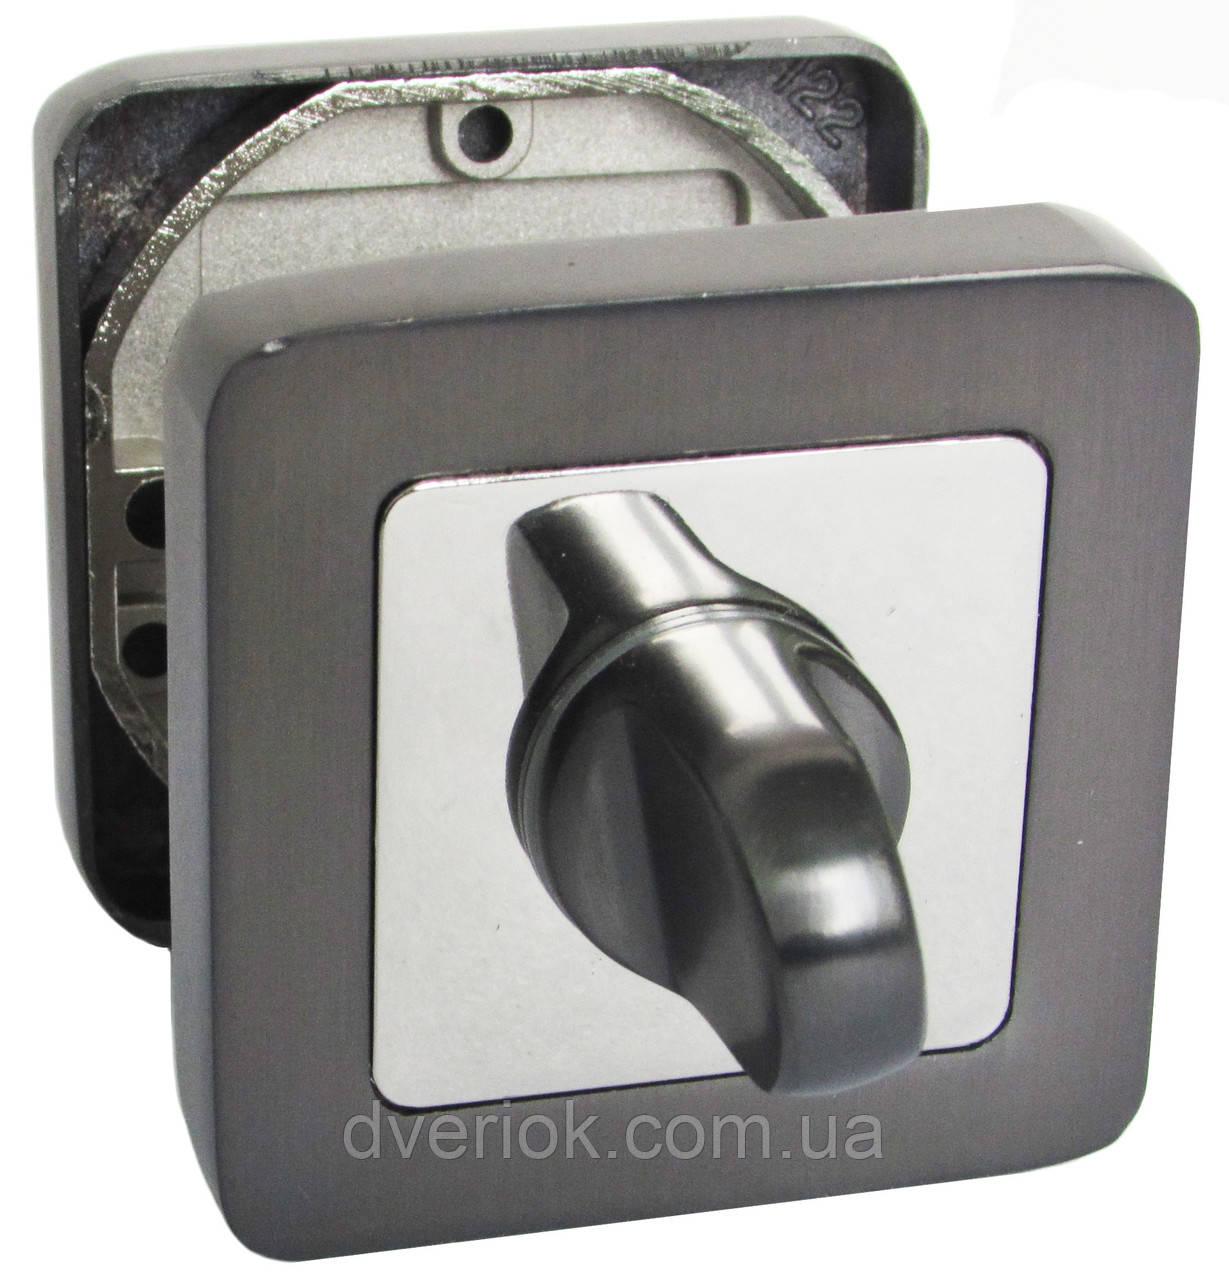 Накладка-поворотник USK Z-70WC MBN/NP графит